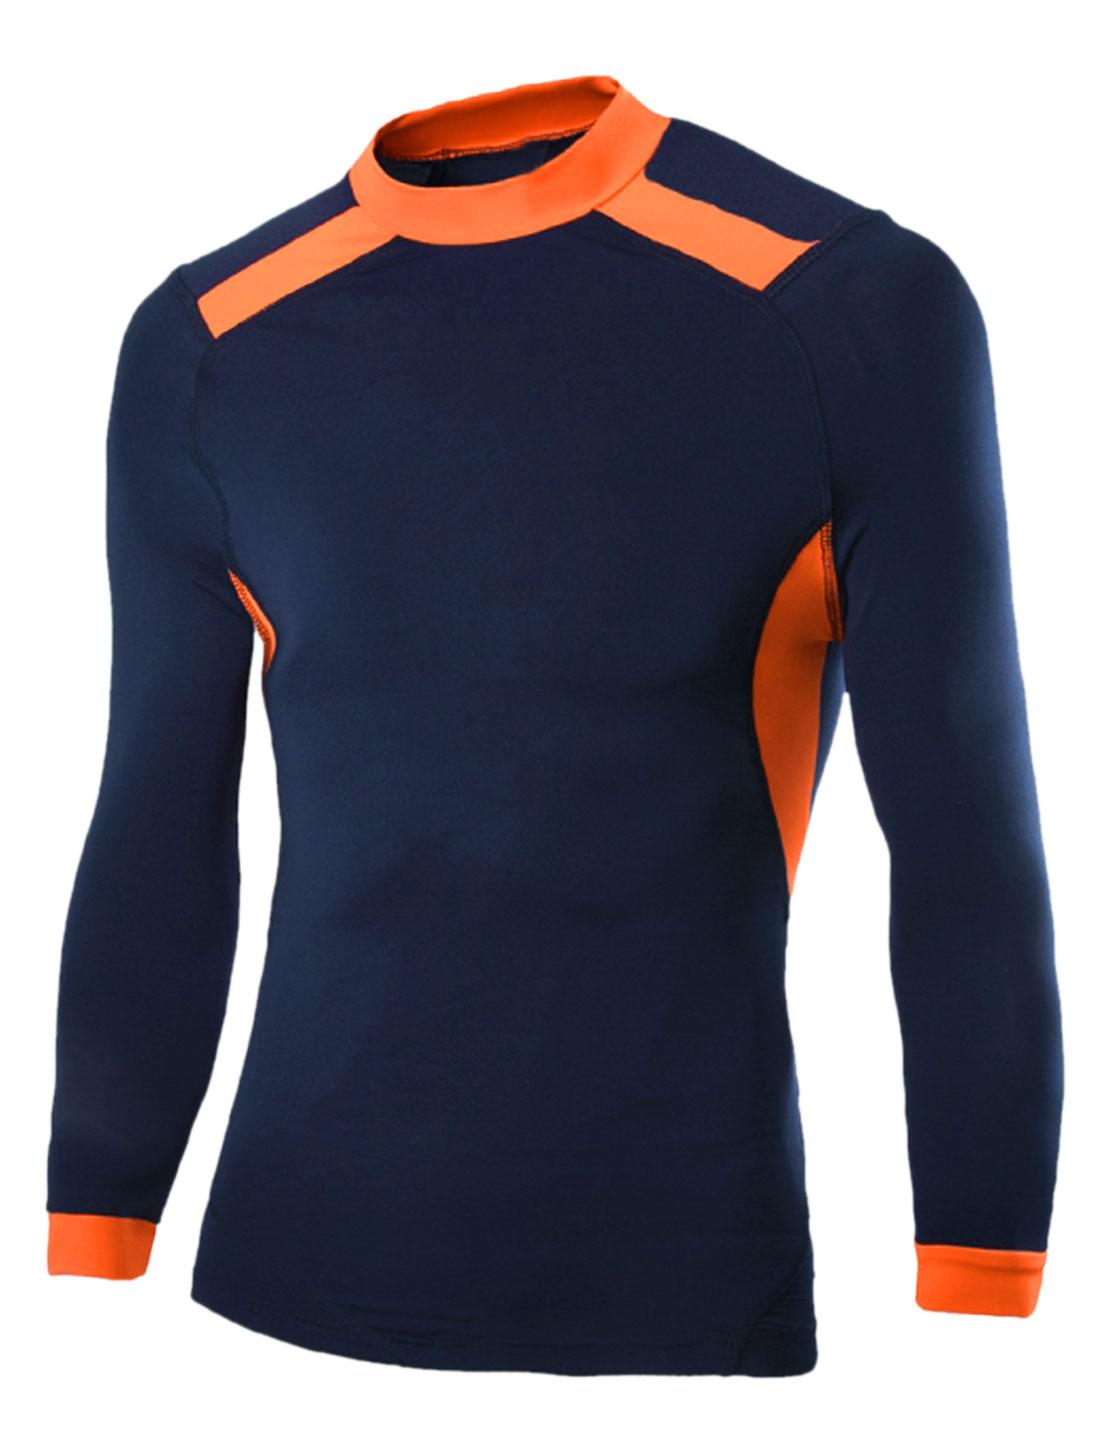 Men Sportswear Contrast Color Moisture-Wicking T-Shirt Navy Blue